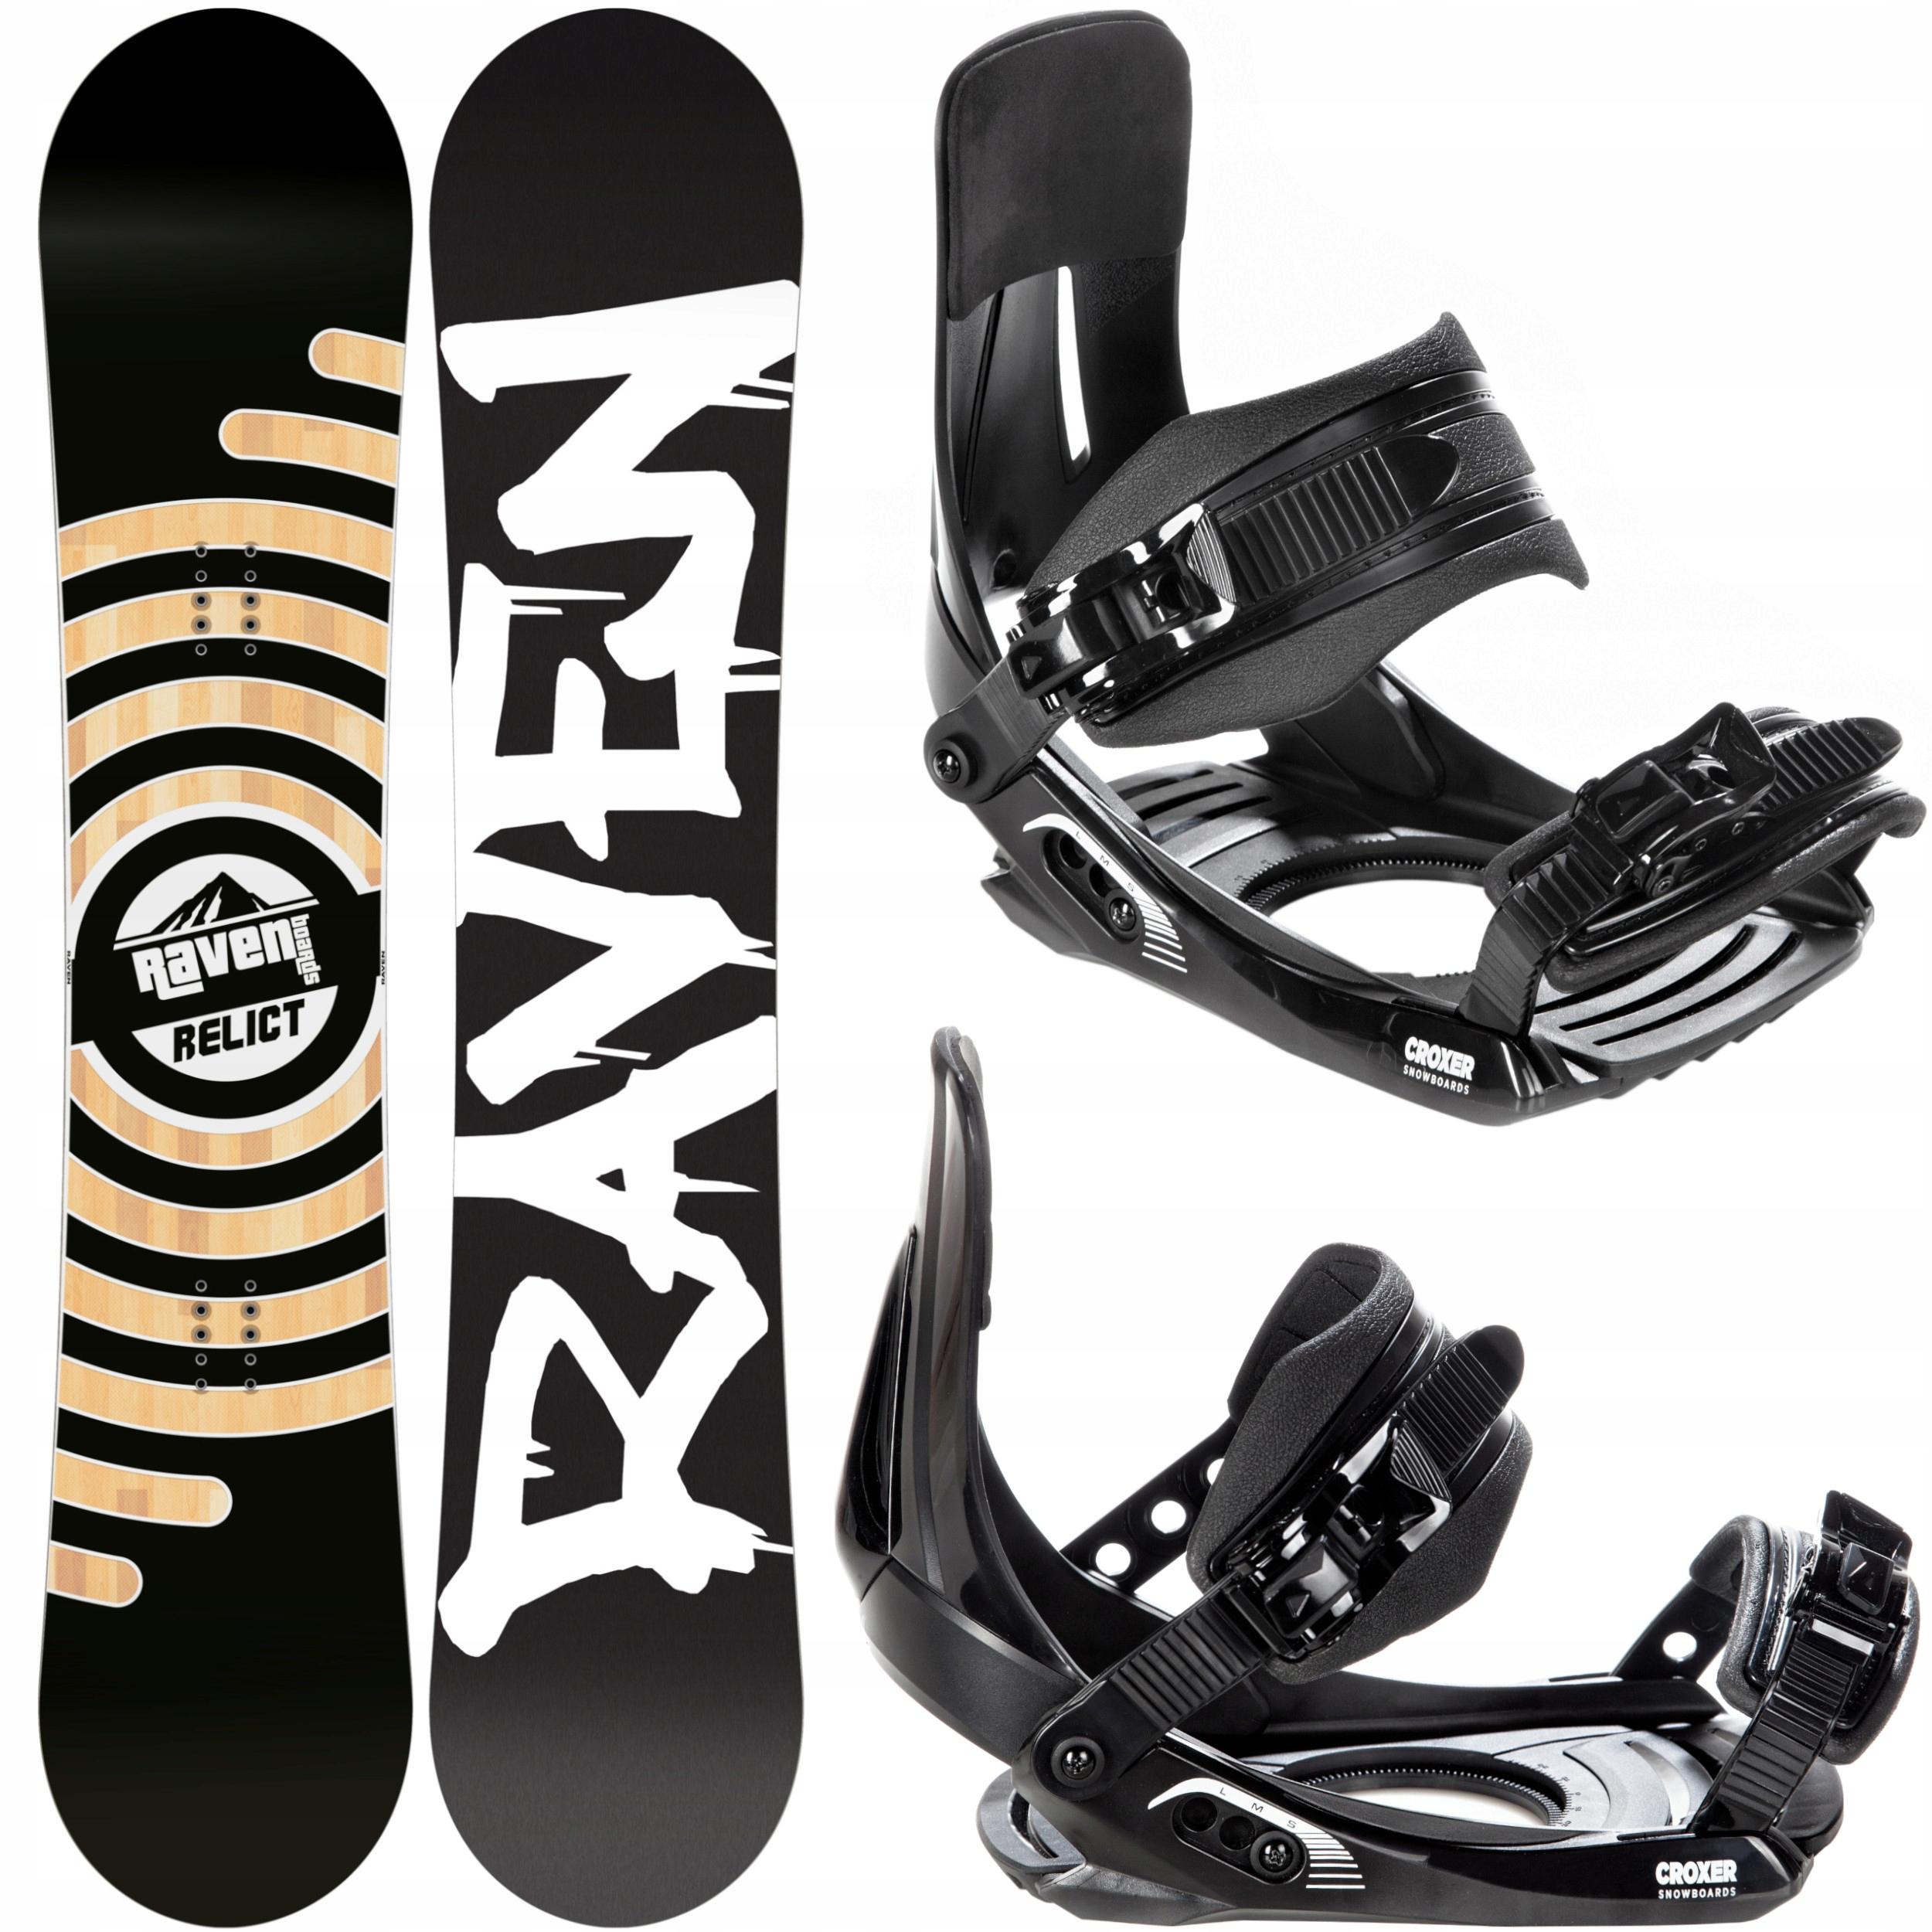 Snowboard RAVEN Reliktné 2020 152 cm +viazanie Croxer